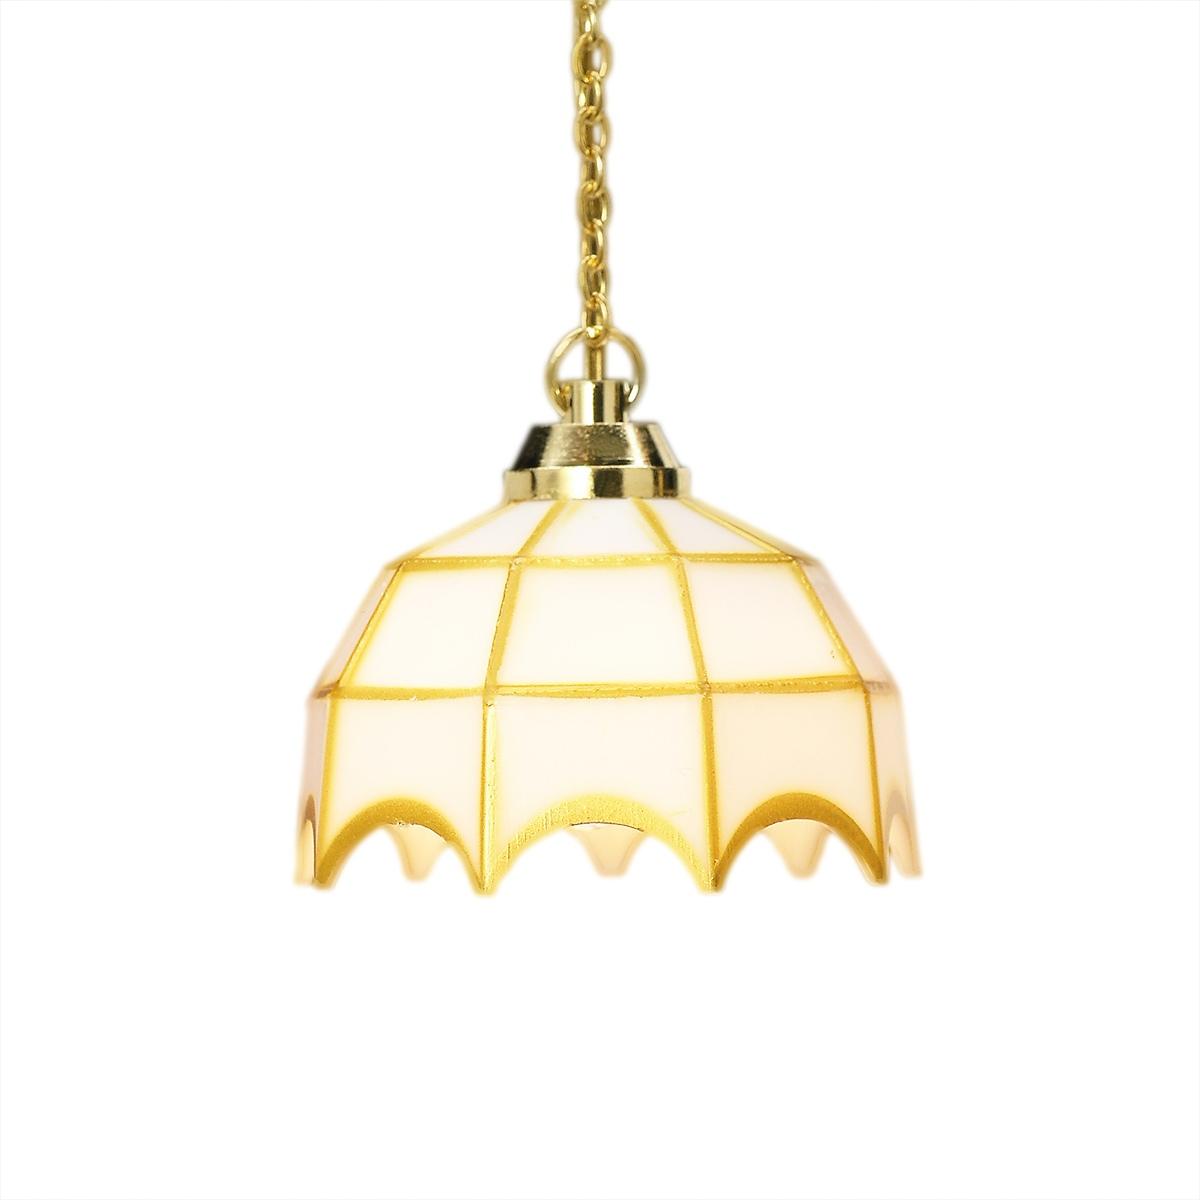 LED battery Tiffany hanging ceiling lamp, MiniLux